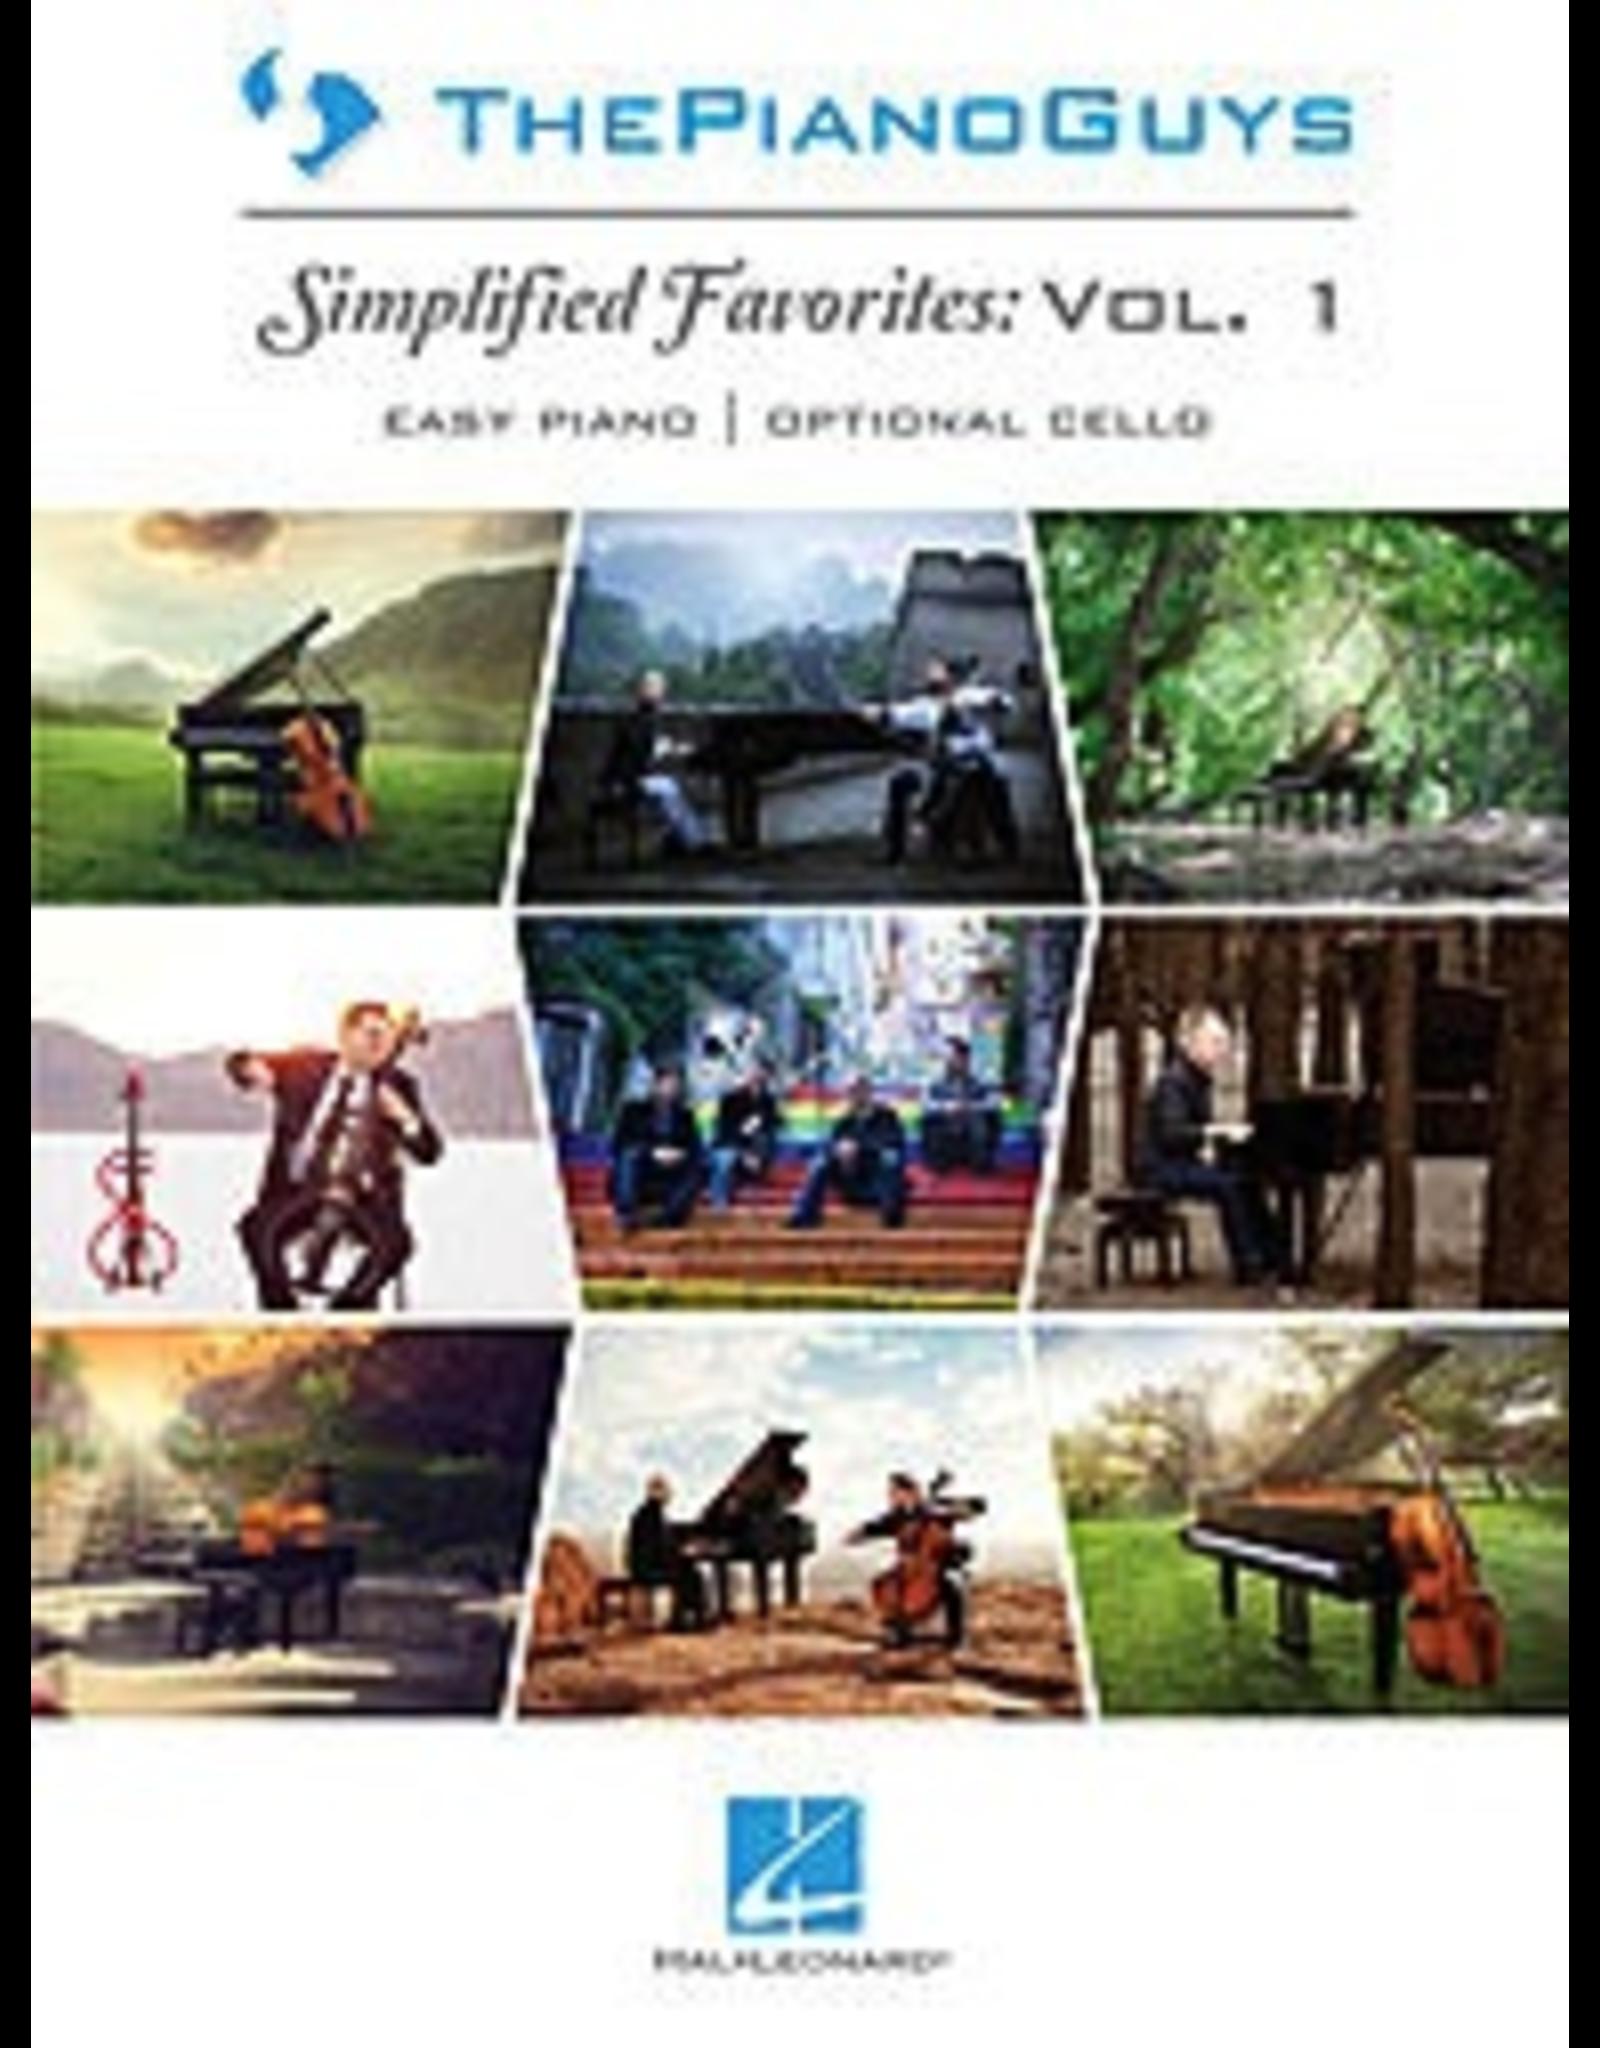 Hal Leonard Piano Guys Simplified Favorites Volume 1 Easy Piano | Cello